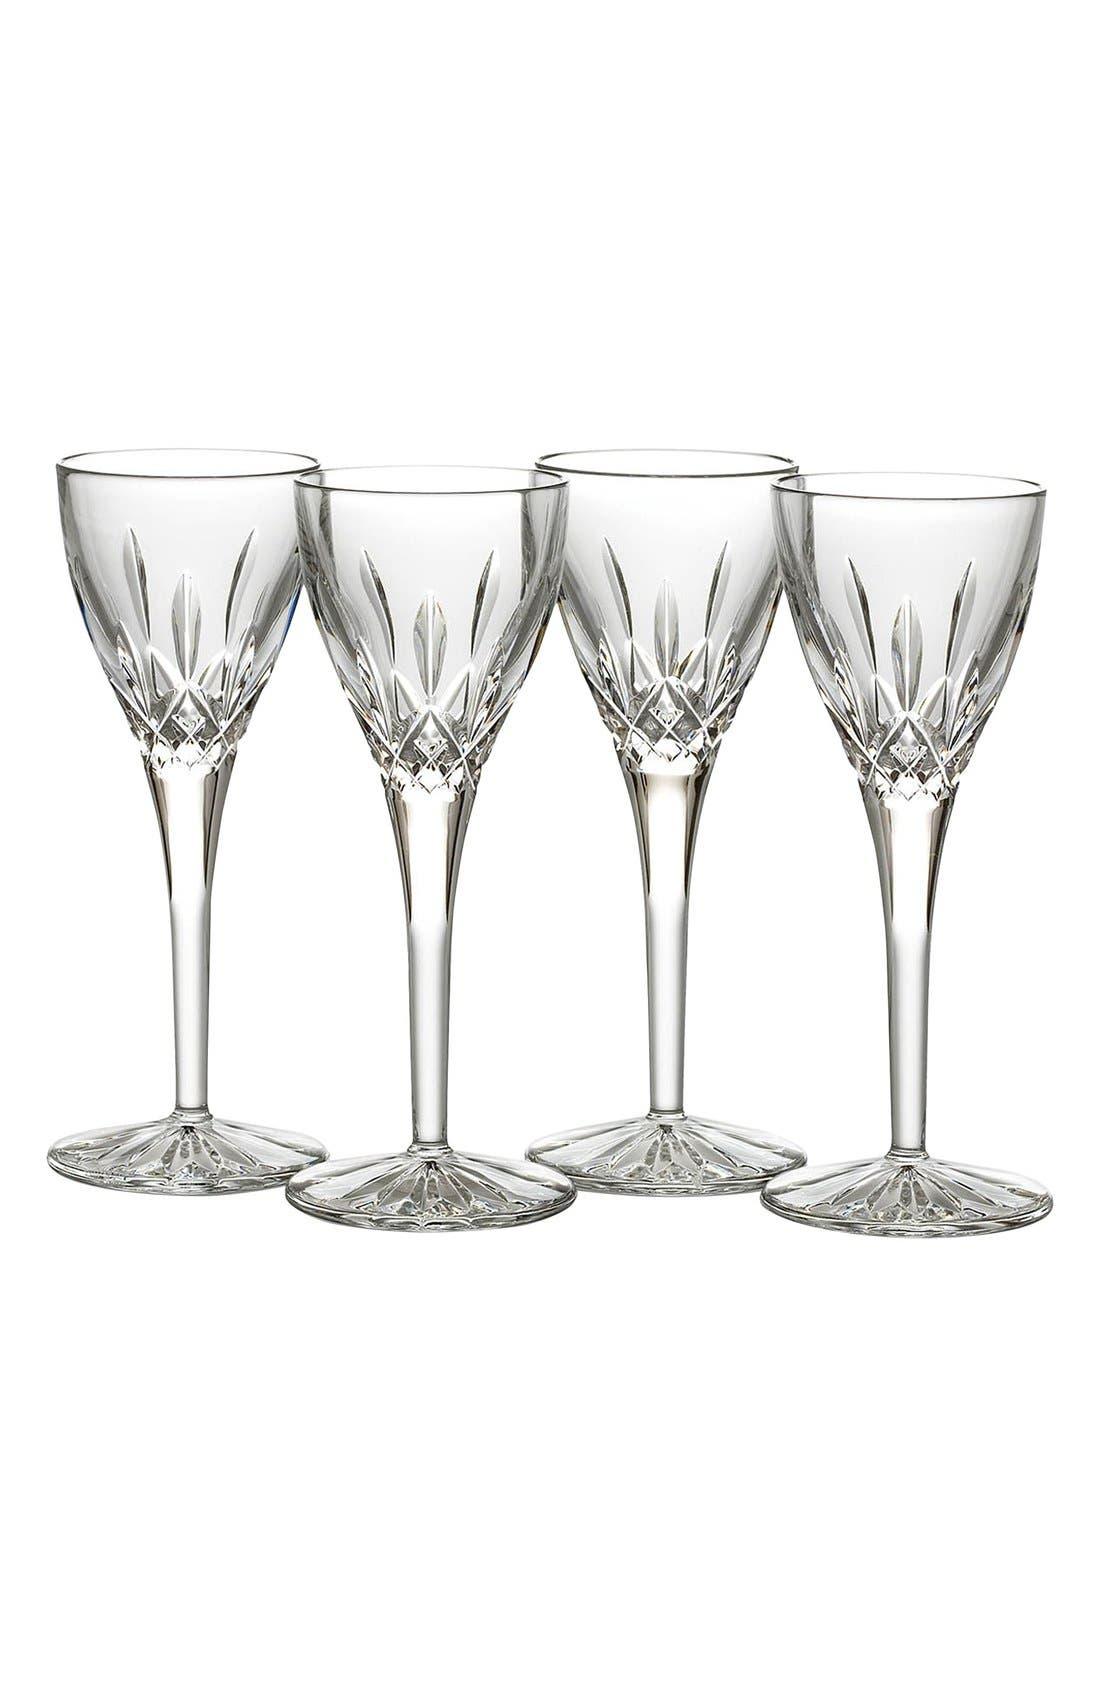 Waterford 'Lismore' Lead Crystal Cordial Glasses (Set of 4)